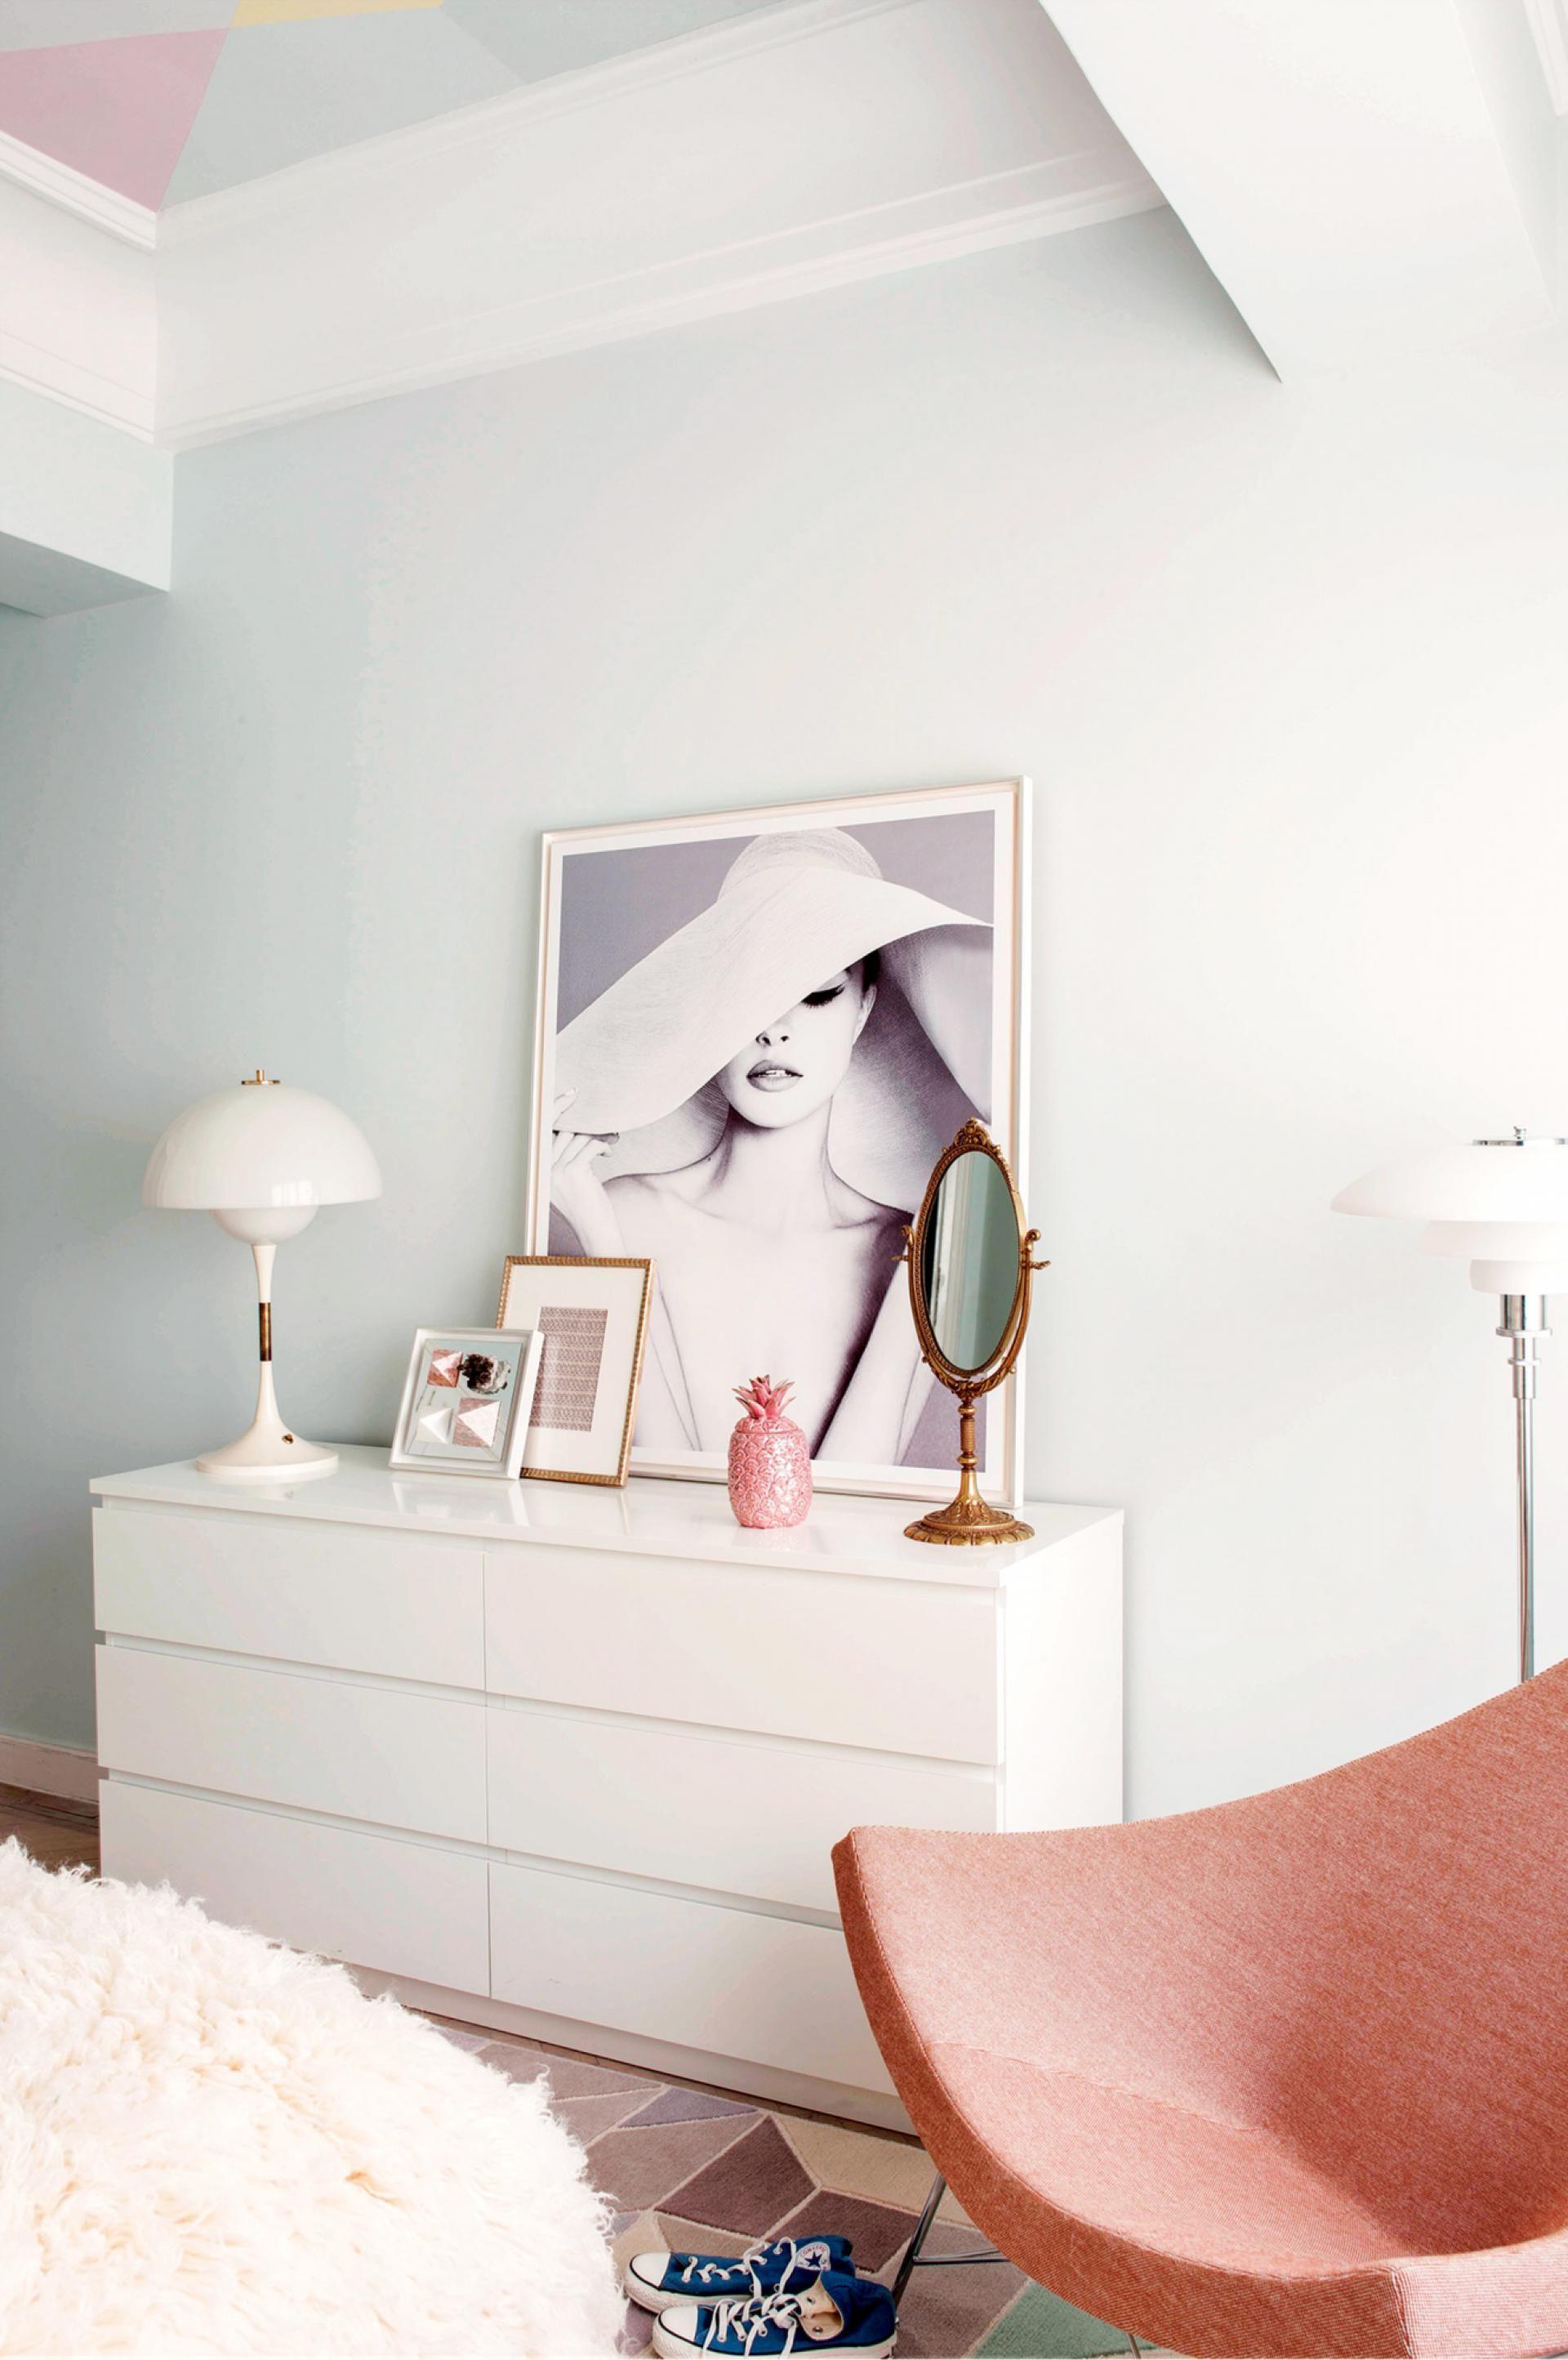 d coration fleurie et color e ikea pinterest ikea malm dresser ikea malm and malm. Black Bedroom Furniture Sets. Home Design Ideas